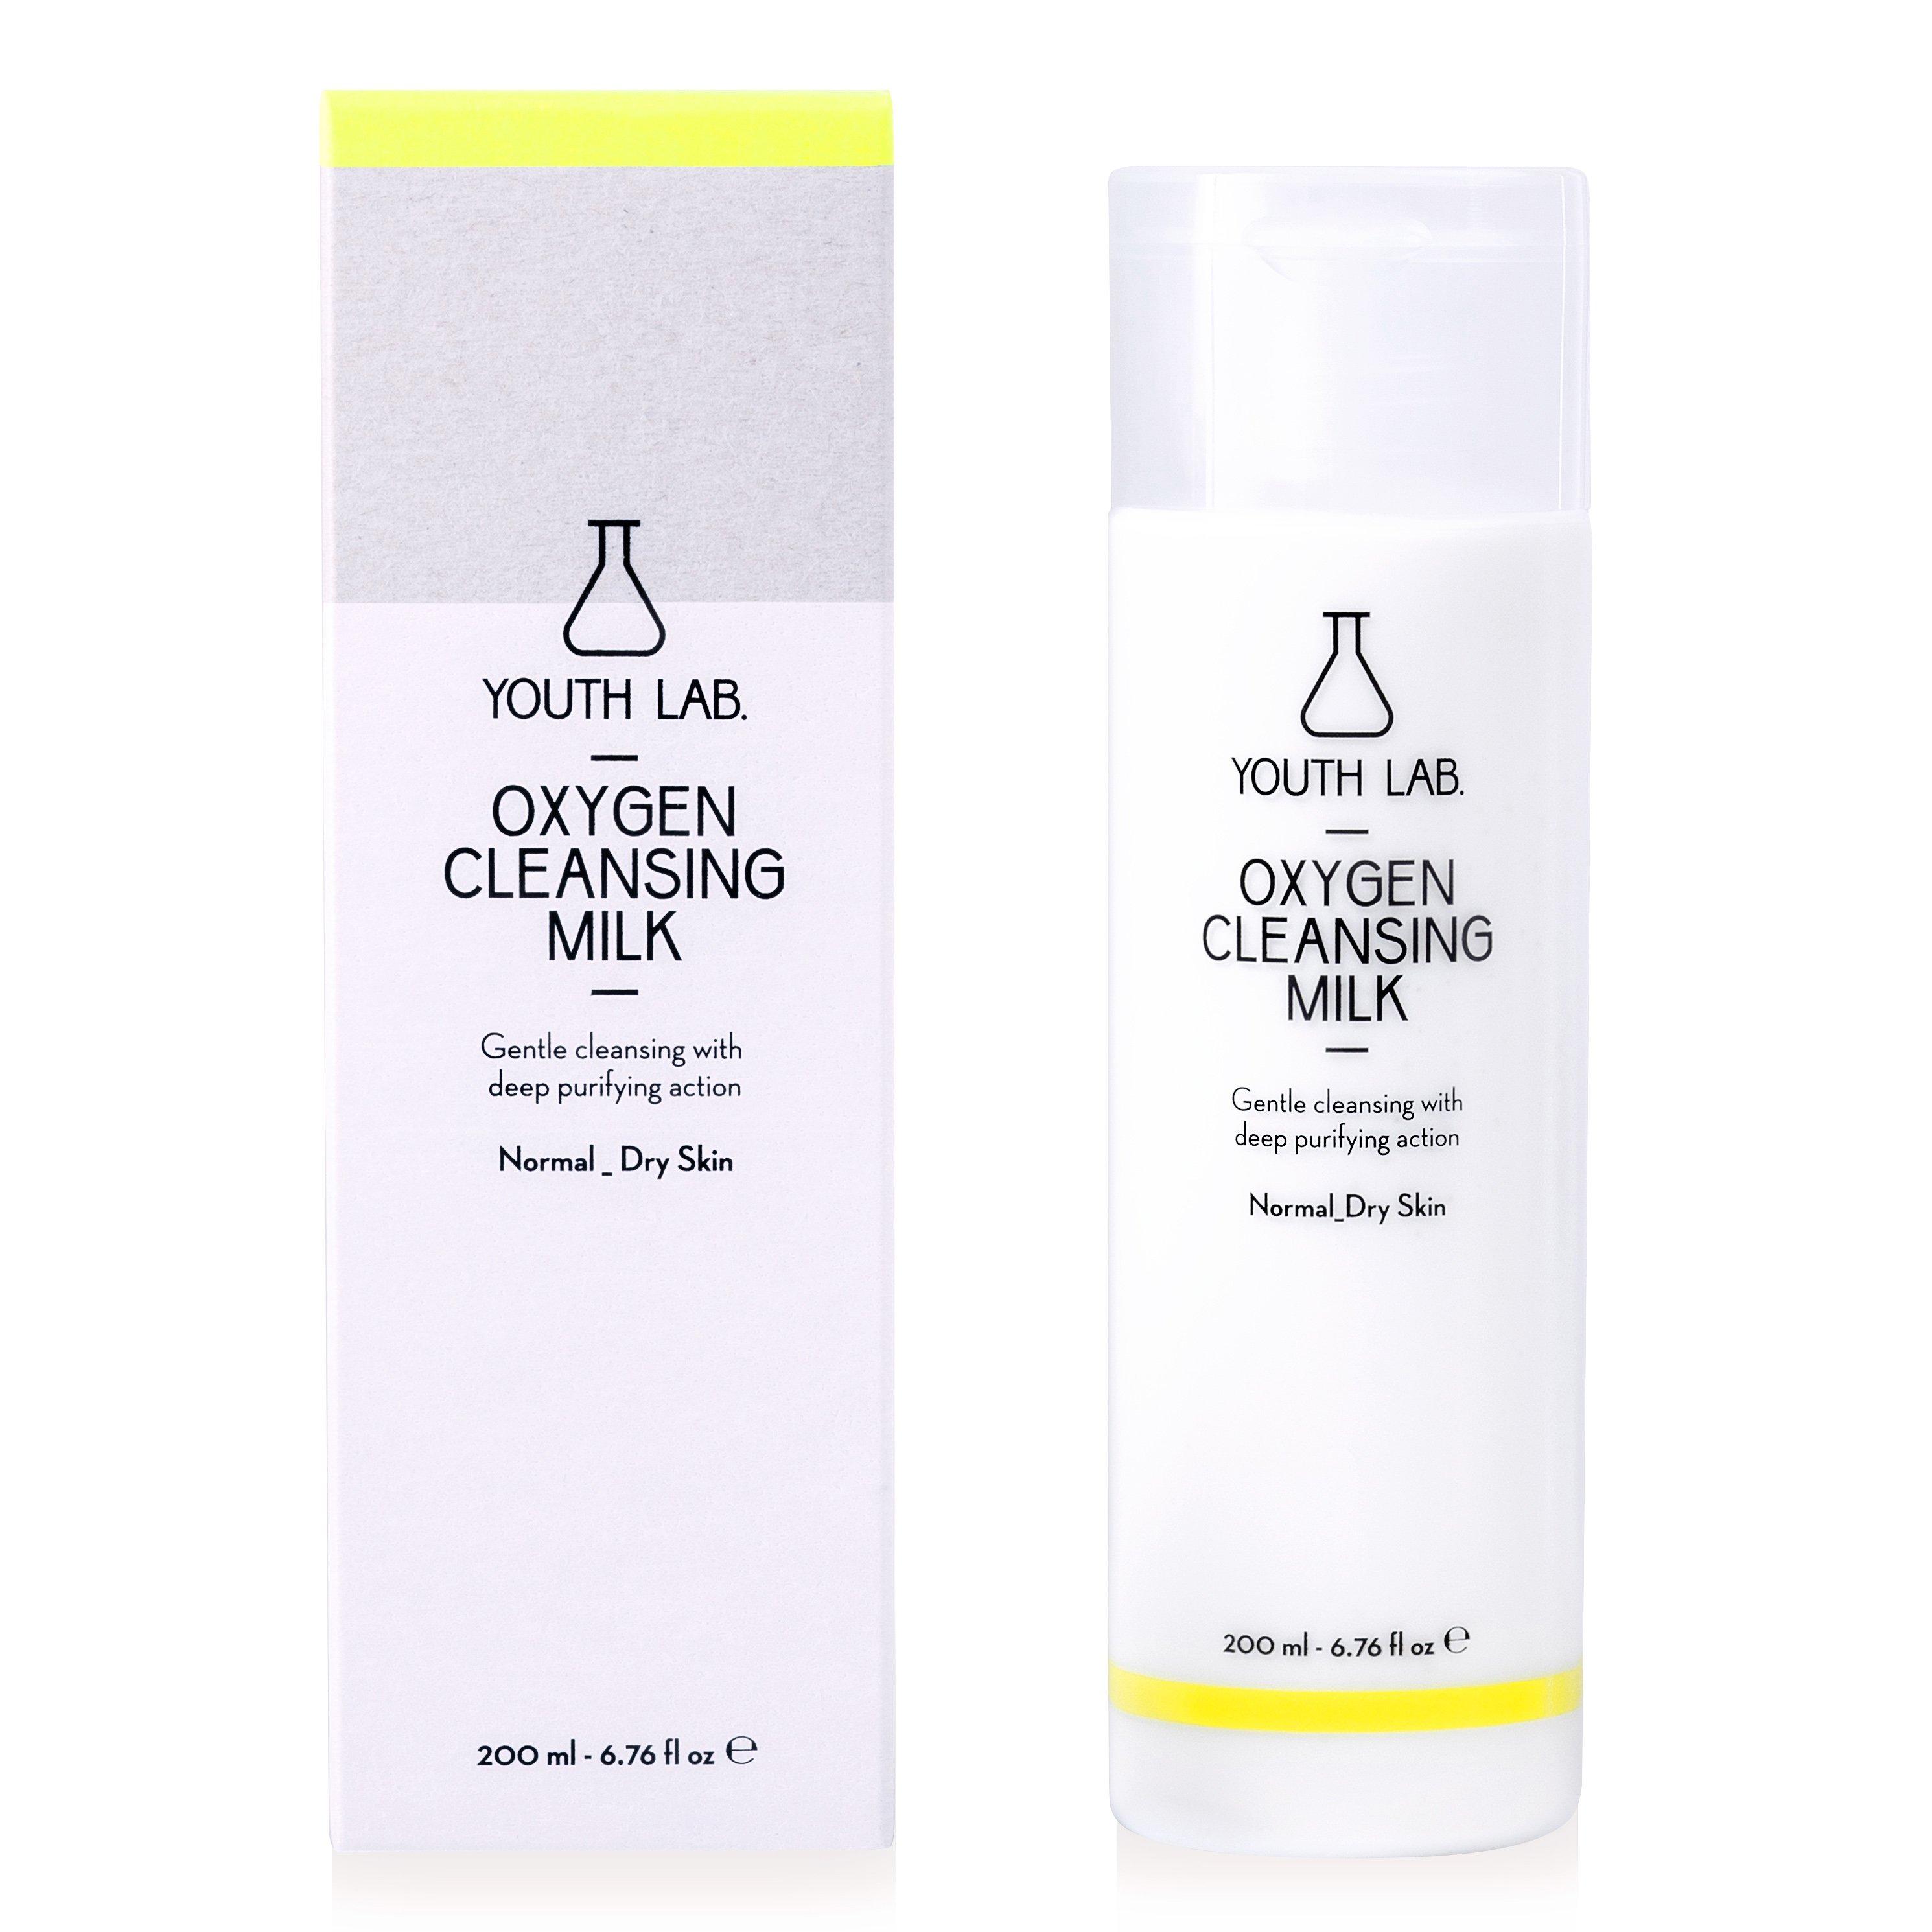 Youth Lab Oxygen Cleansing Milk for Normal Dry Skin Απαλό Γαλάκτωμα Προσώπου με Βαθιά Καθαριστική – Εξυγιαντική Δράση 200ml